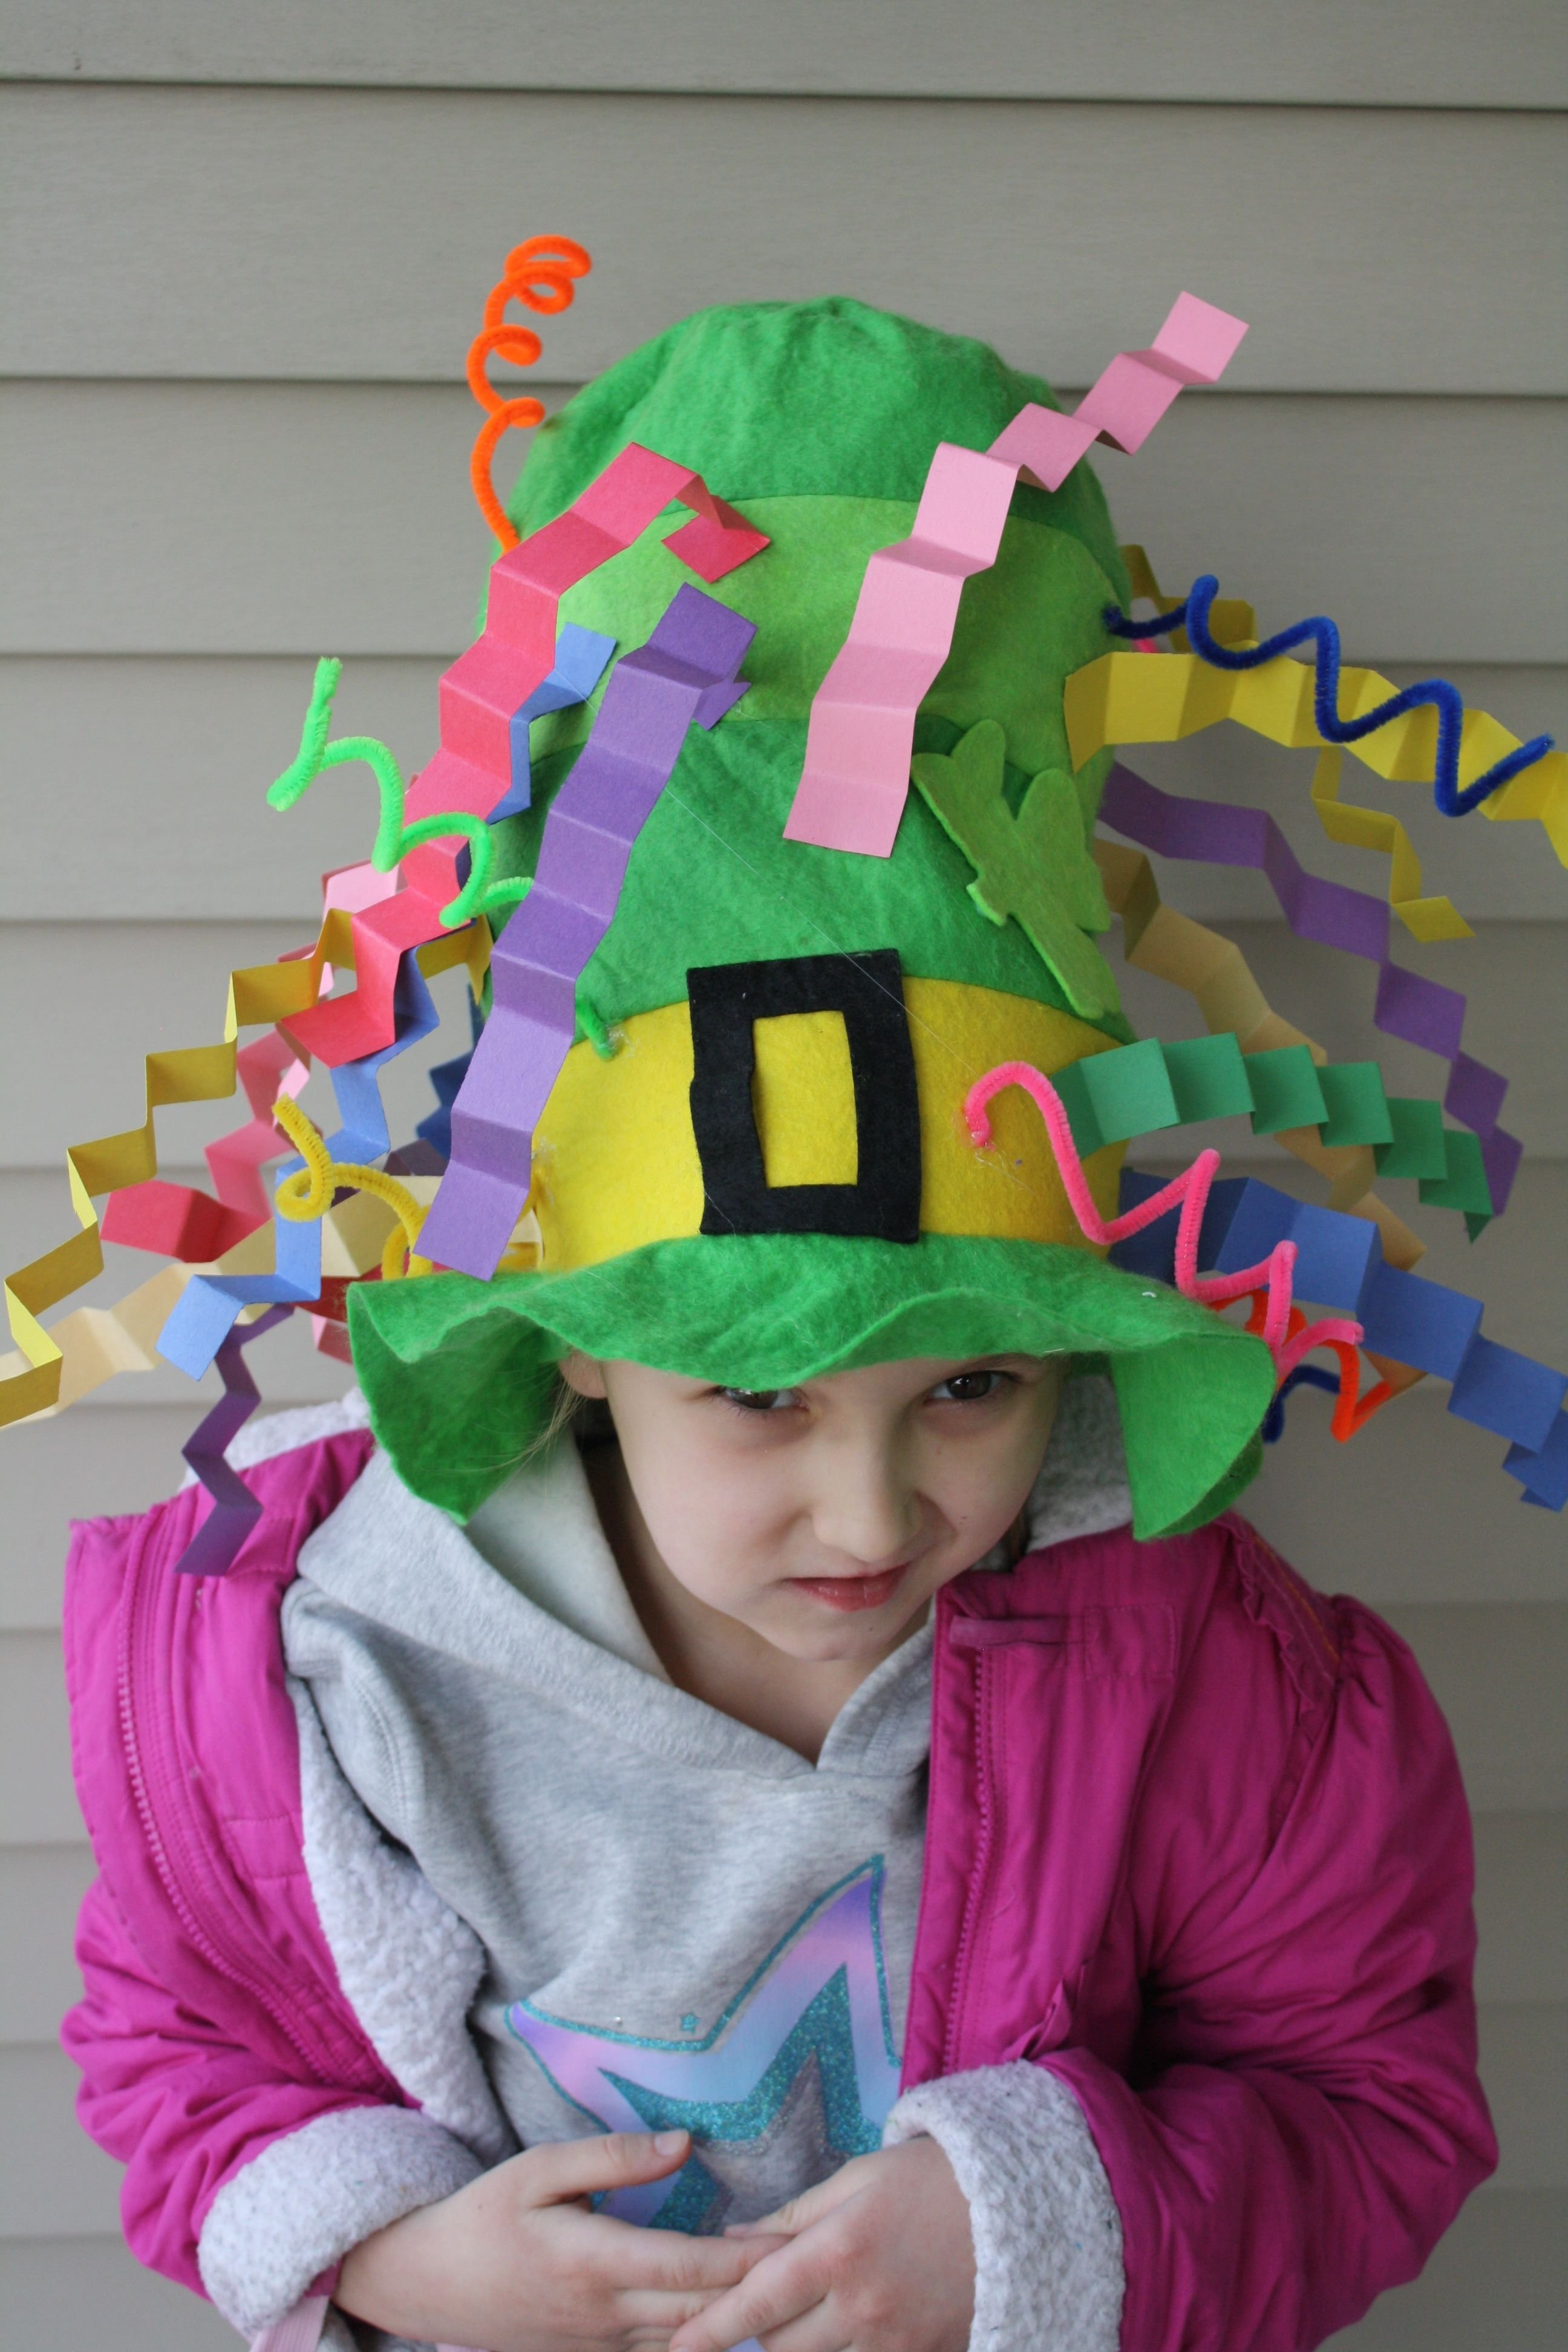 10 Fantastic Crazy Hat Ideas For Kids crazy hat day crazy hat day ideas for school happy mad hatter 2020